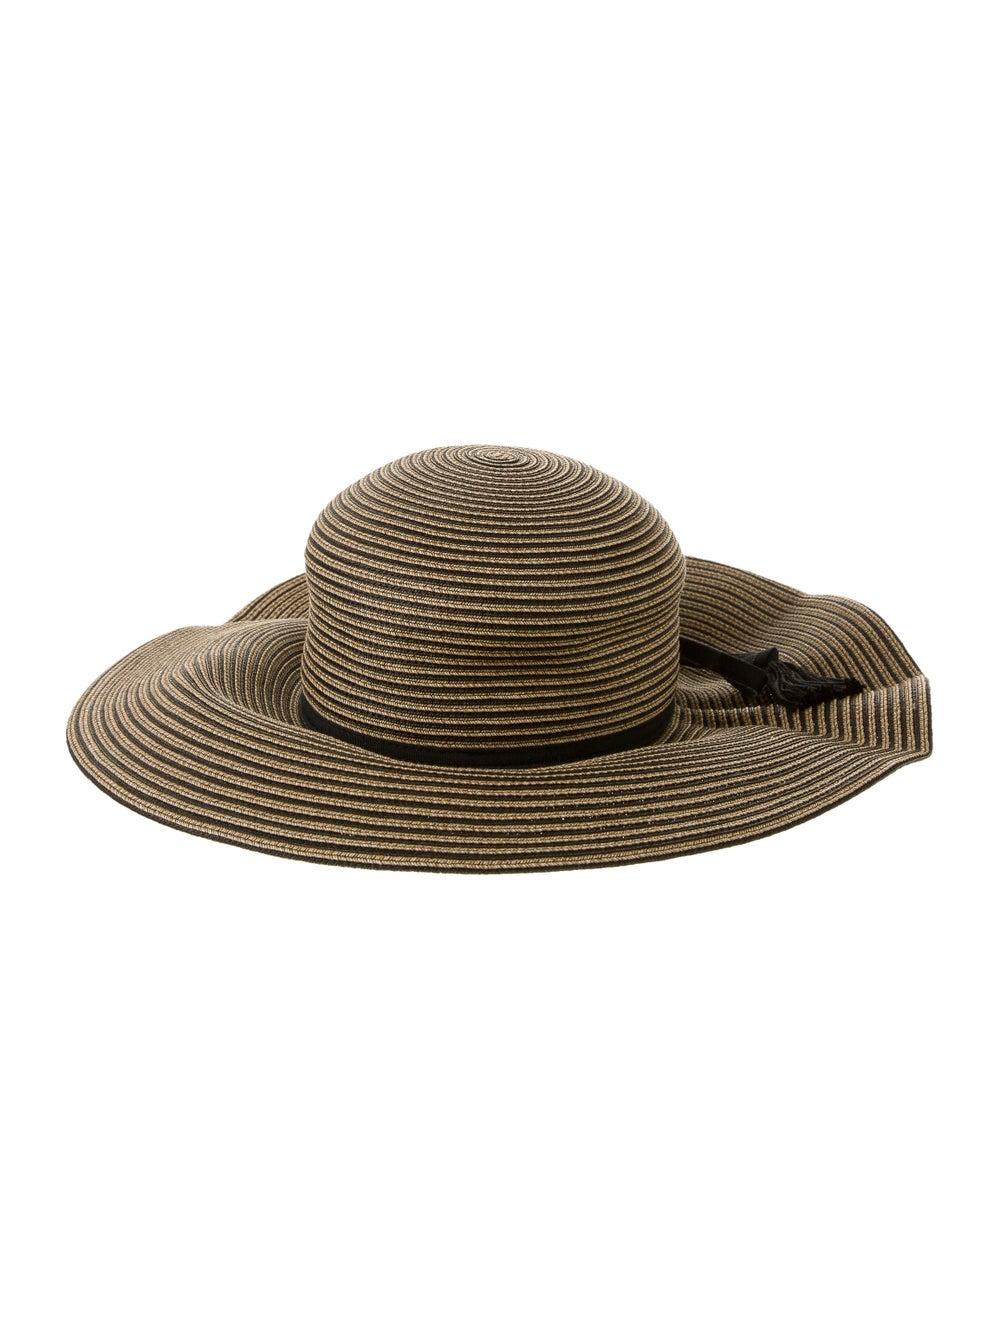 Eric Javits Wide-Brimmed Straw Hat Tan - image 2